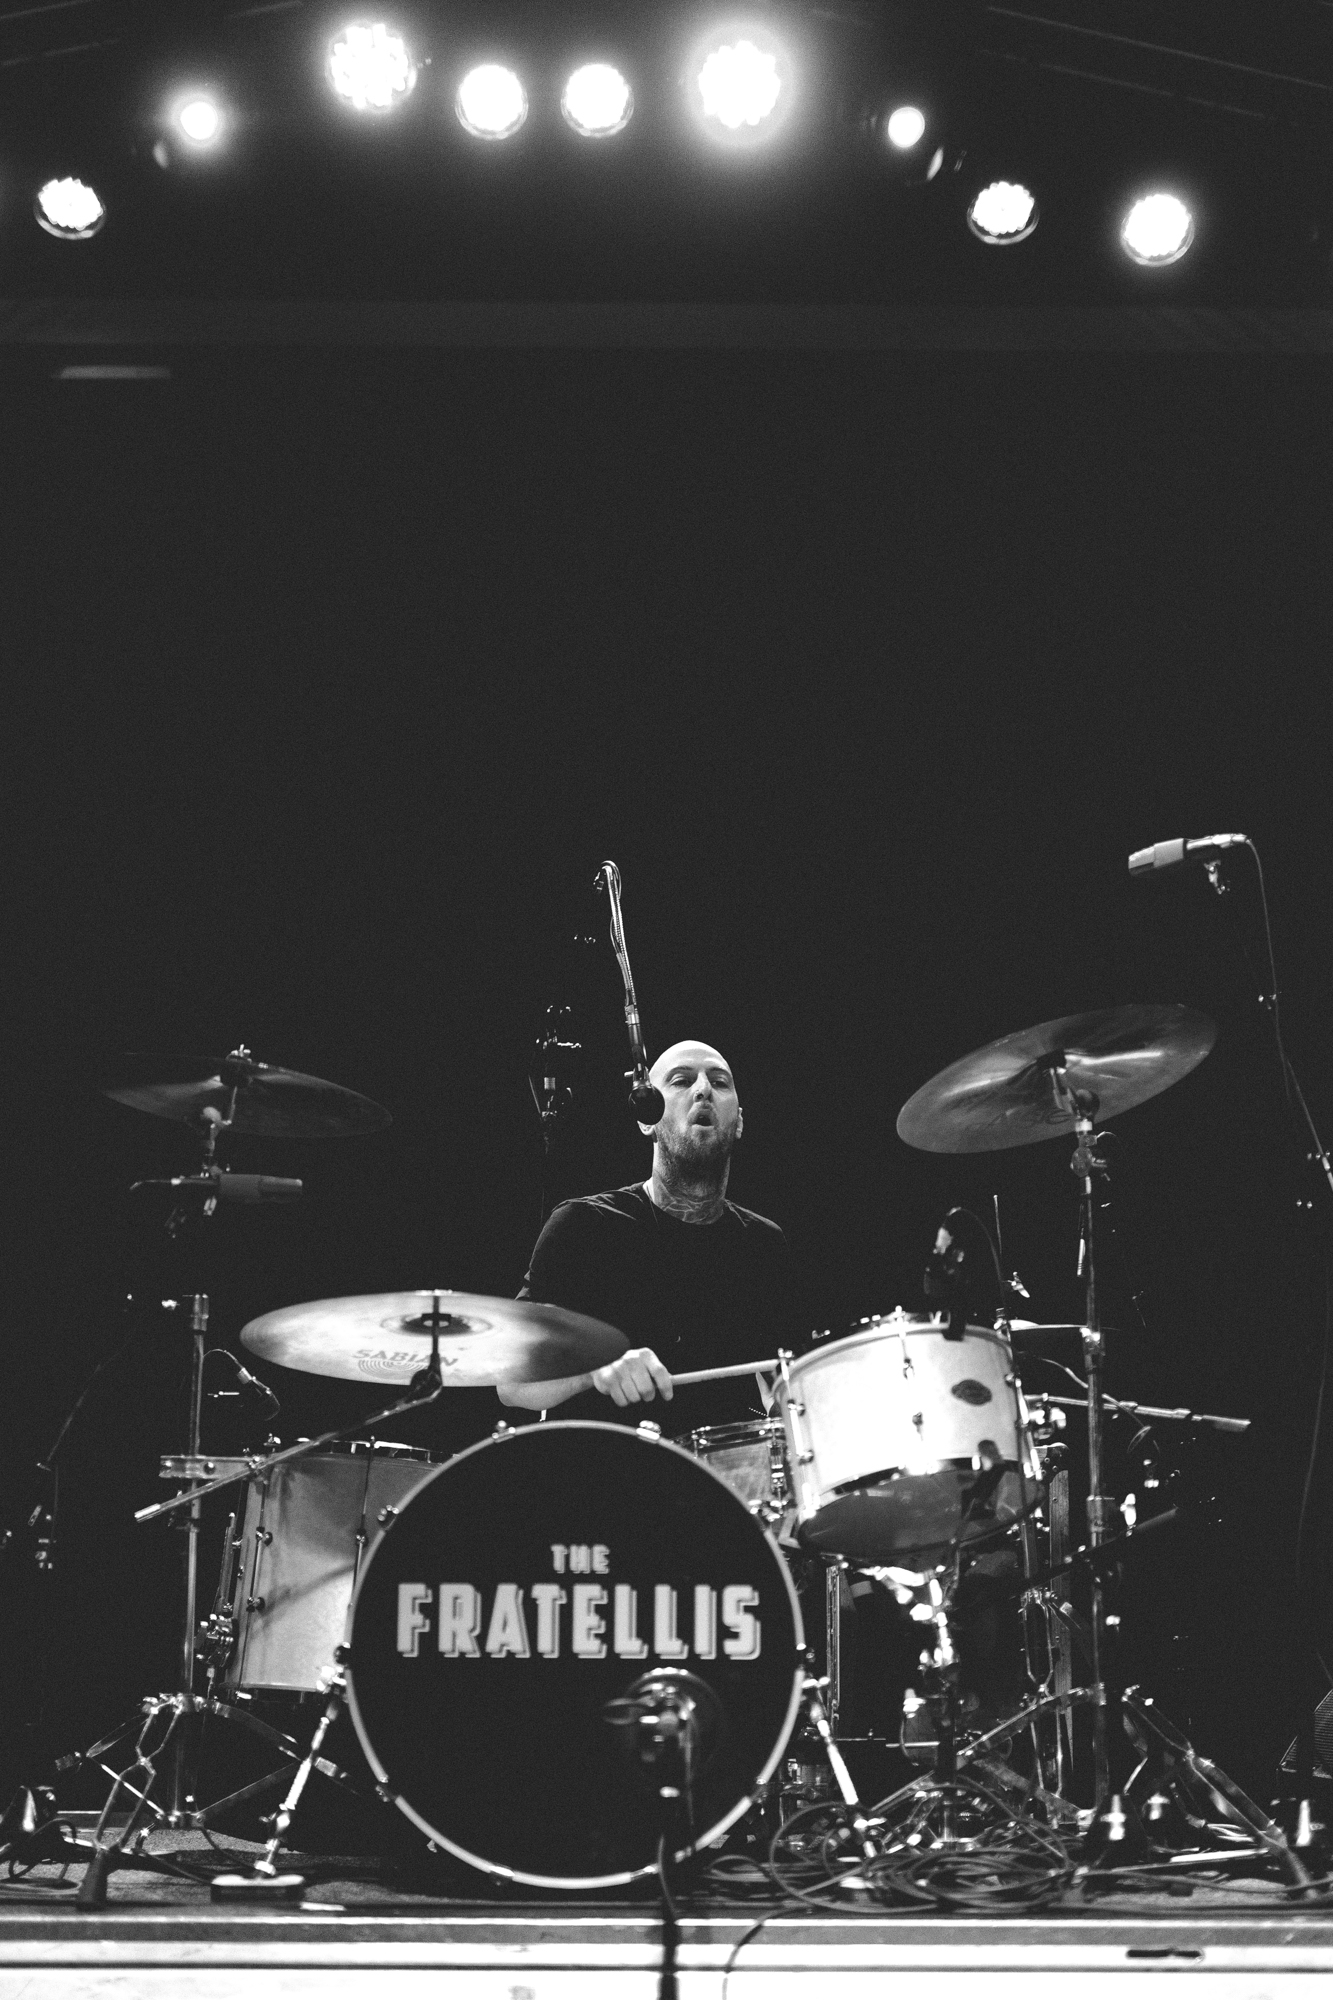 TheFratellis-1917.jpg